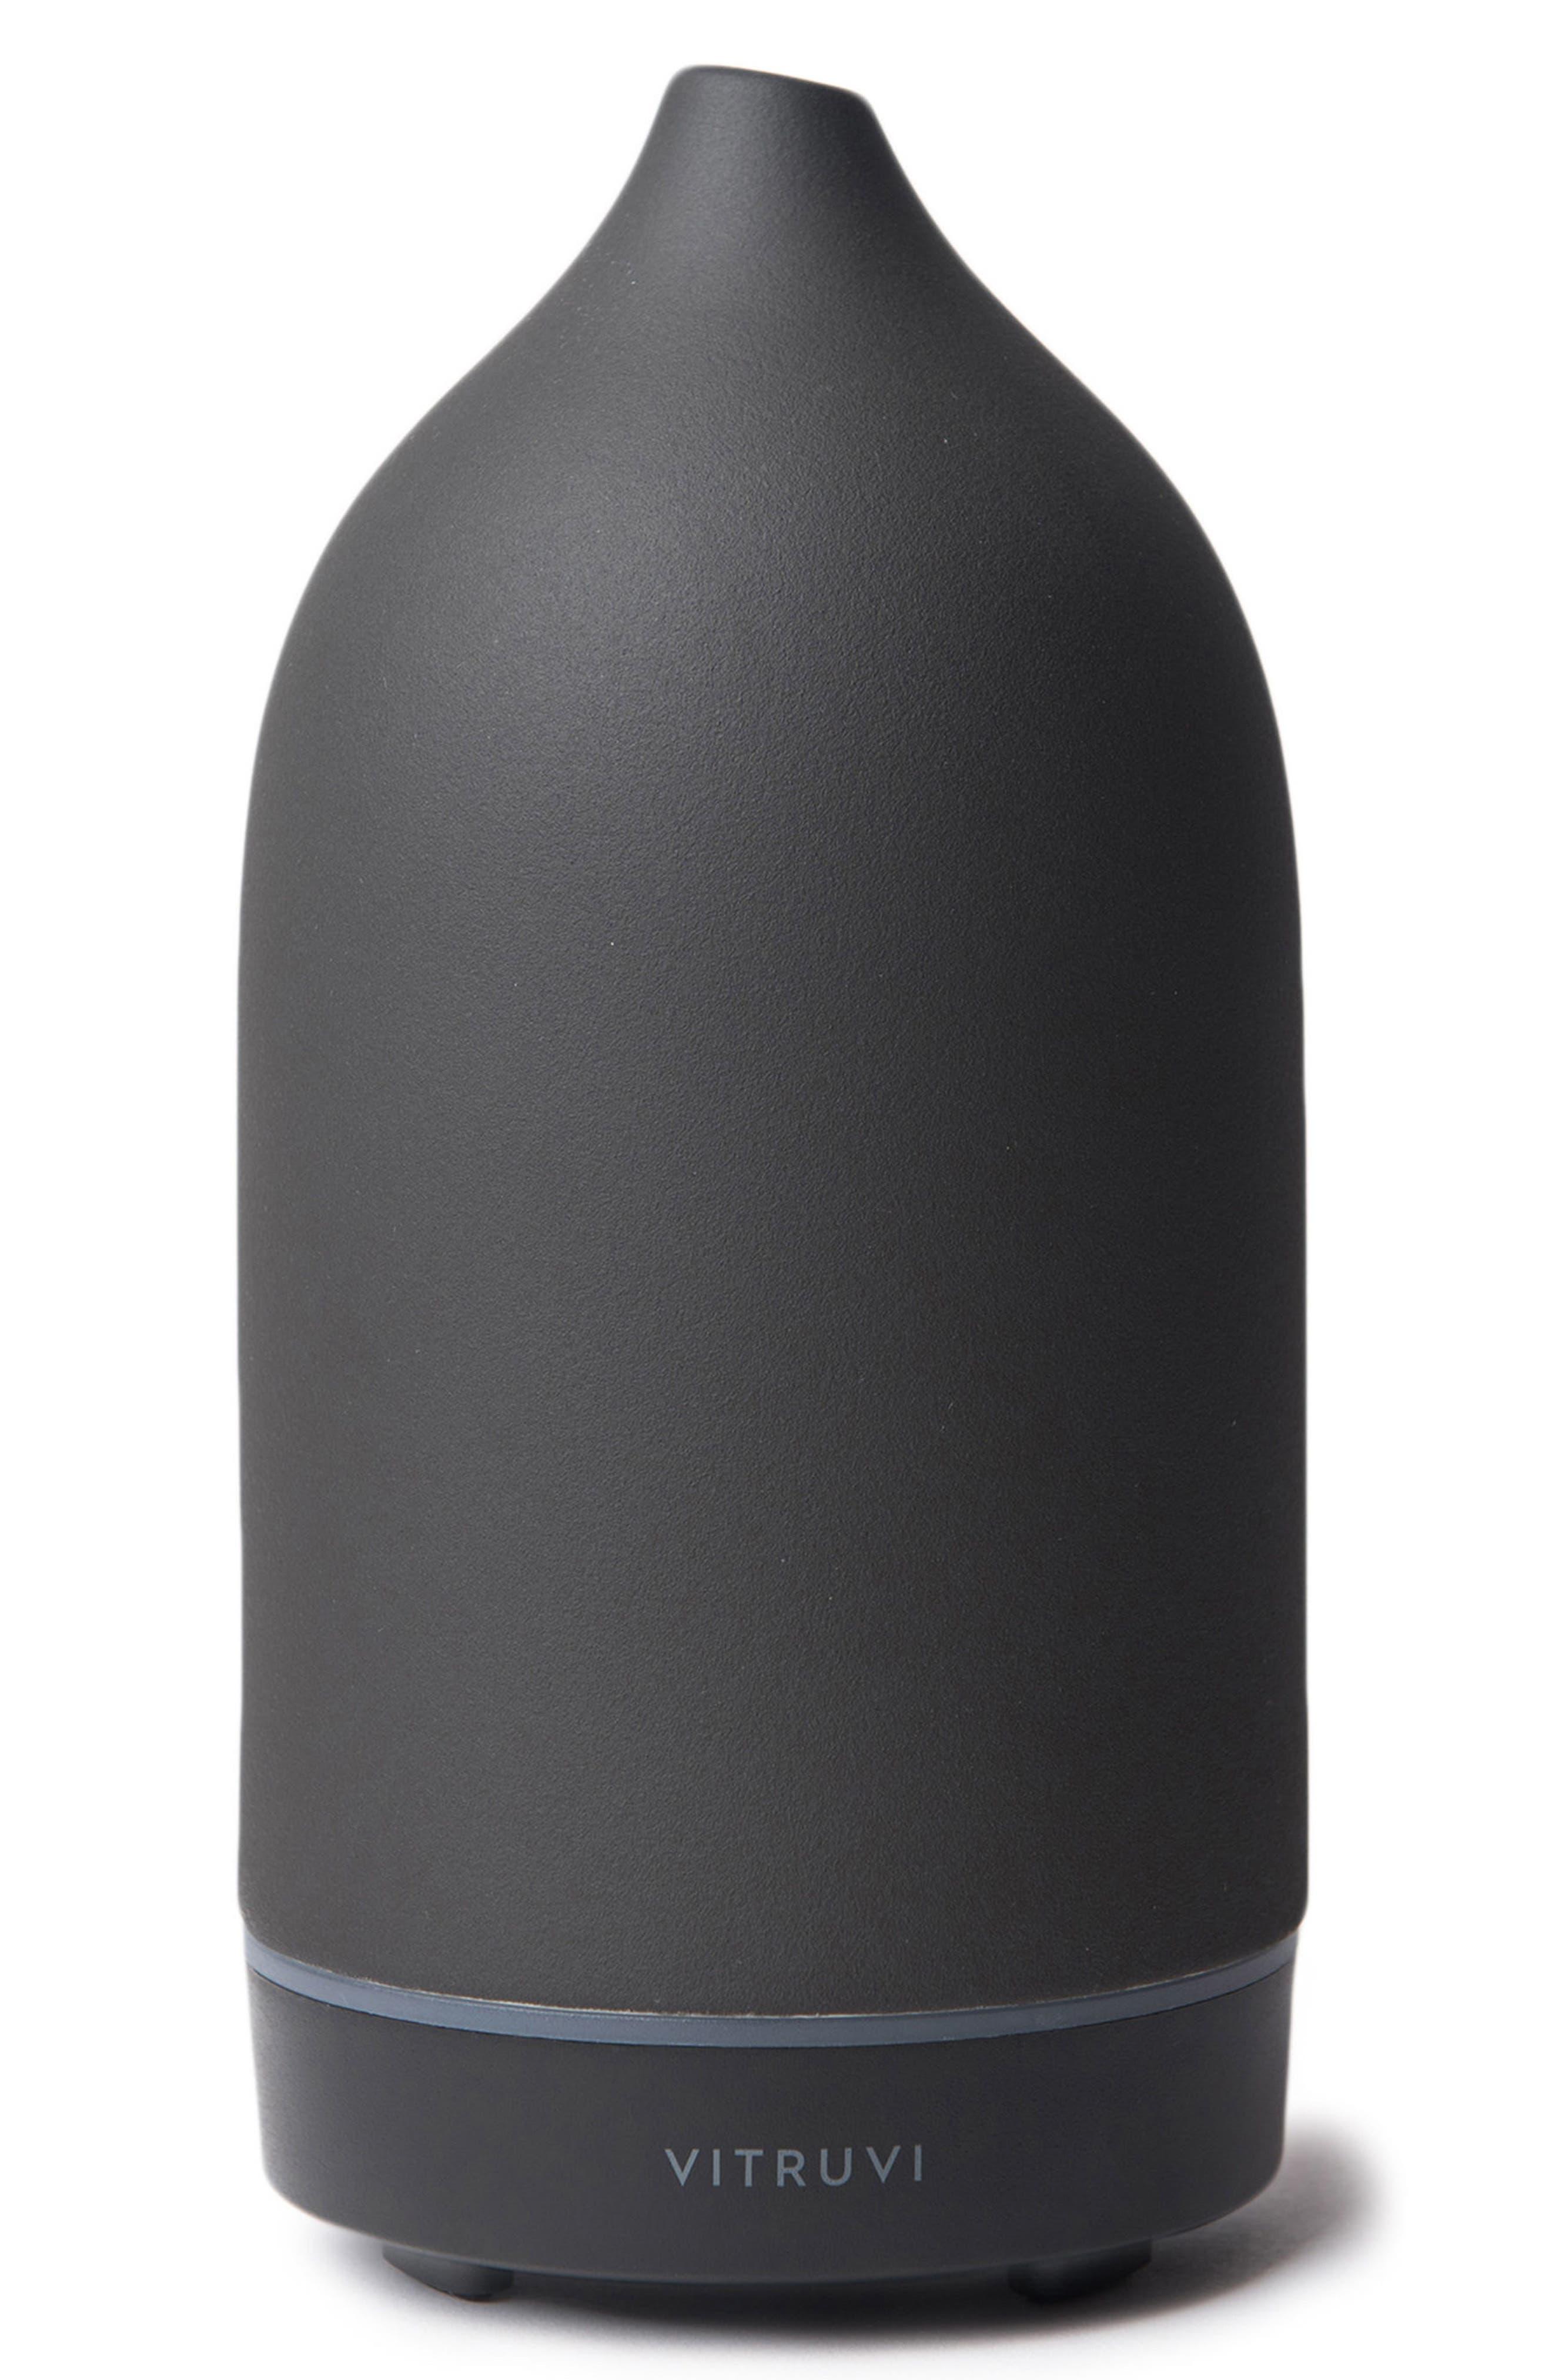 Main Image - Vitruvi Porcelain Essential Oil Diffuser